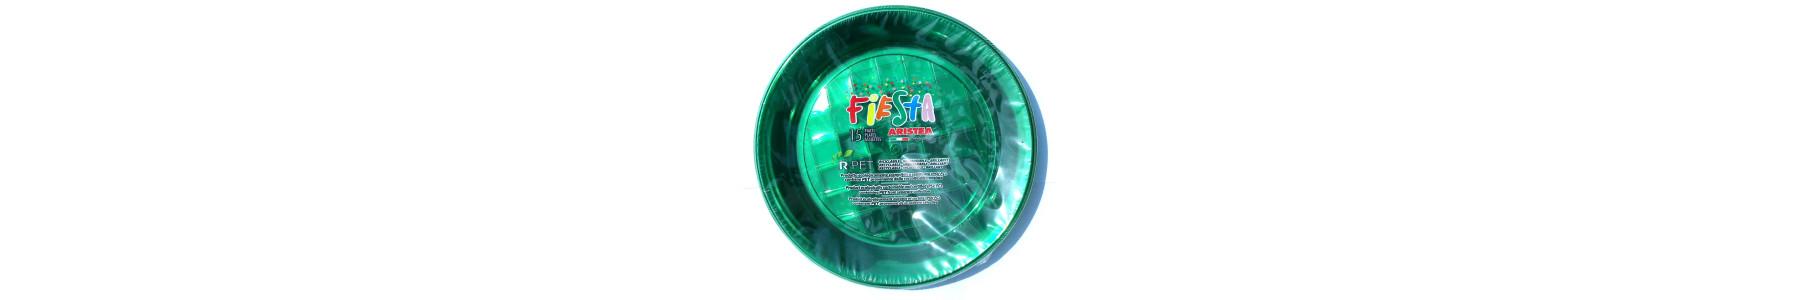 Articole plastic ARISTEA PET - VERDE